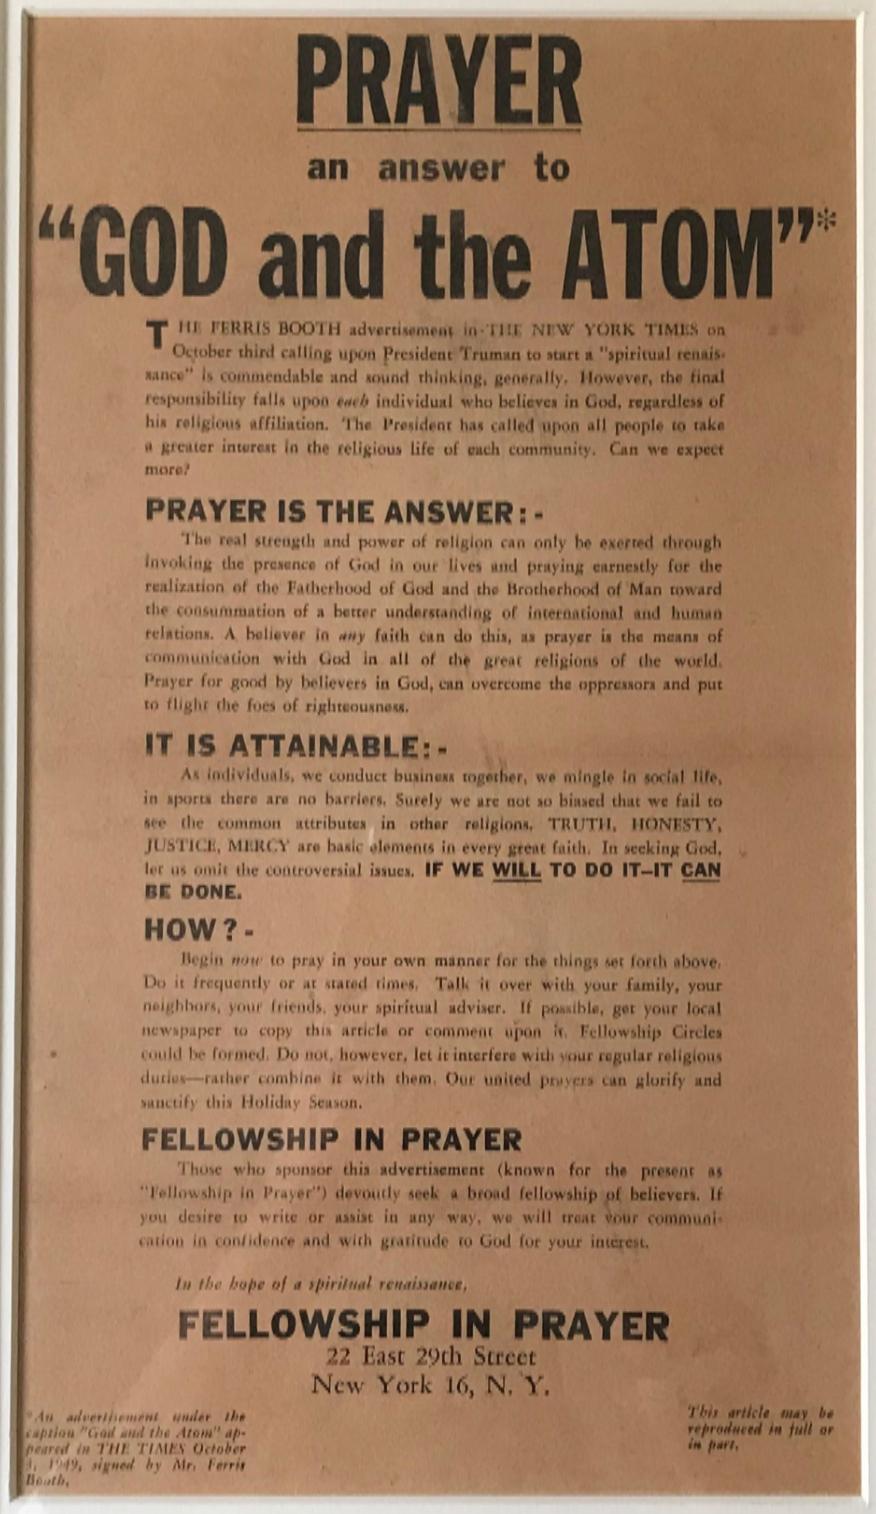 Prayer and the ATOM